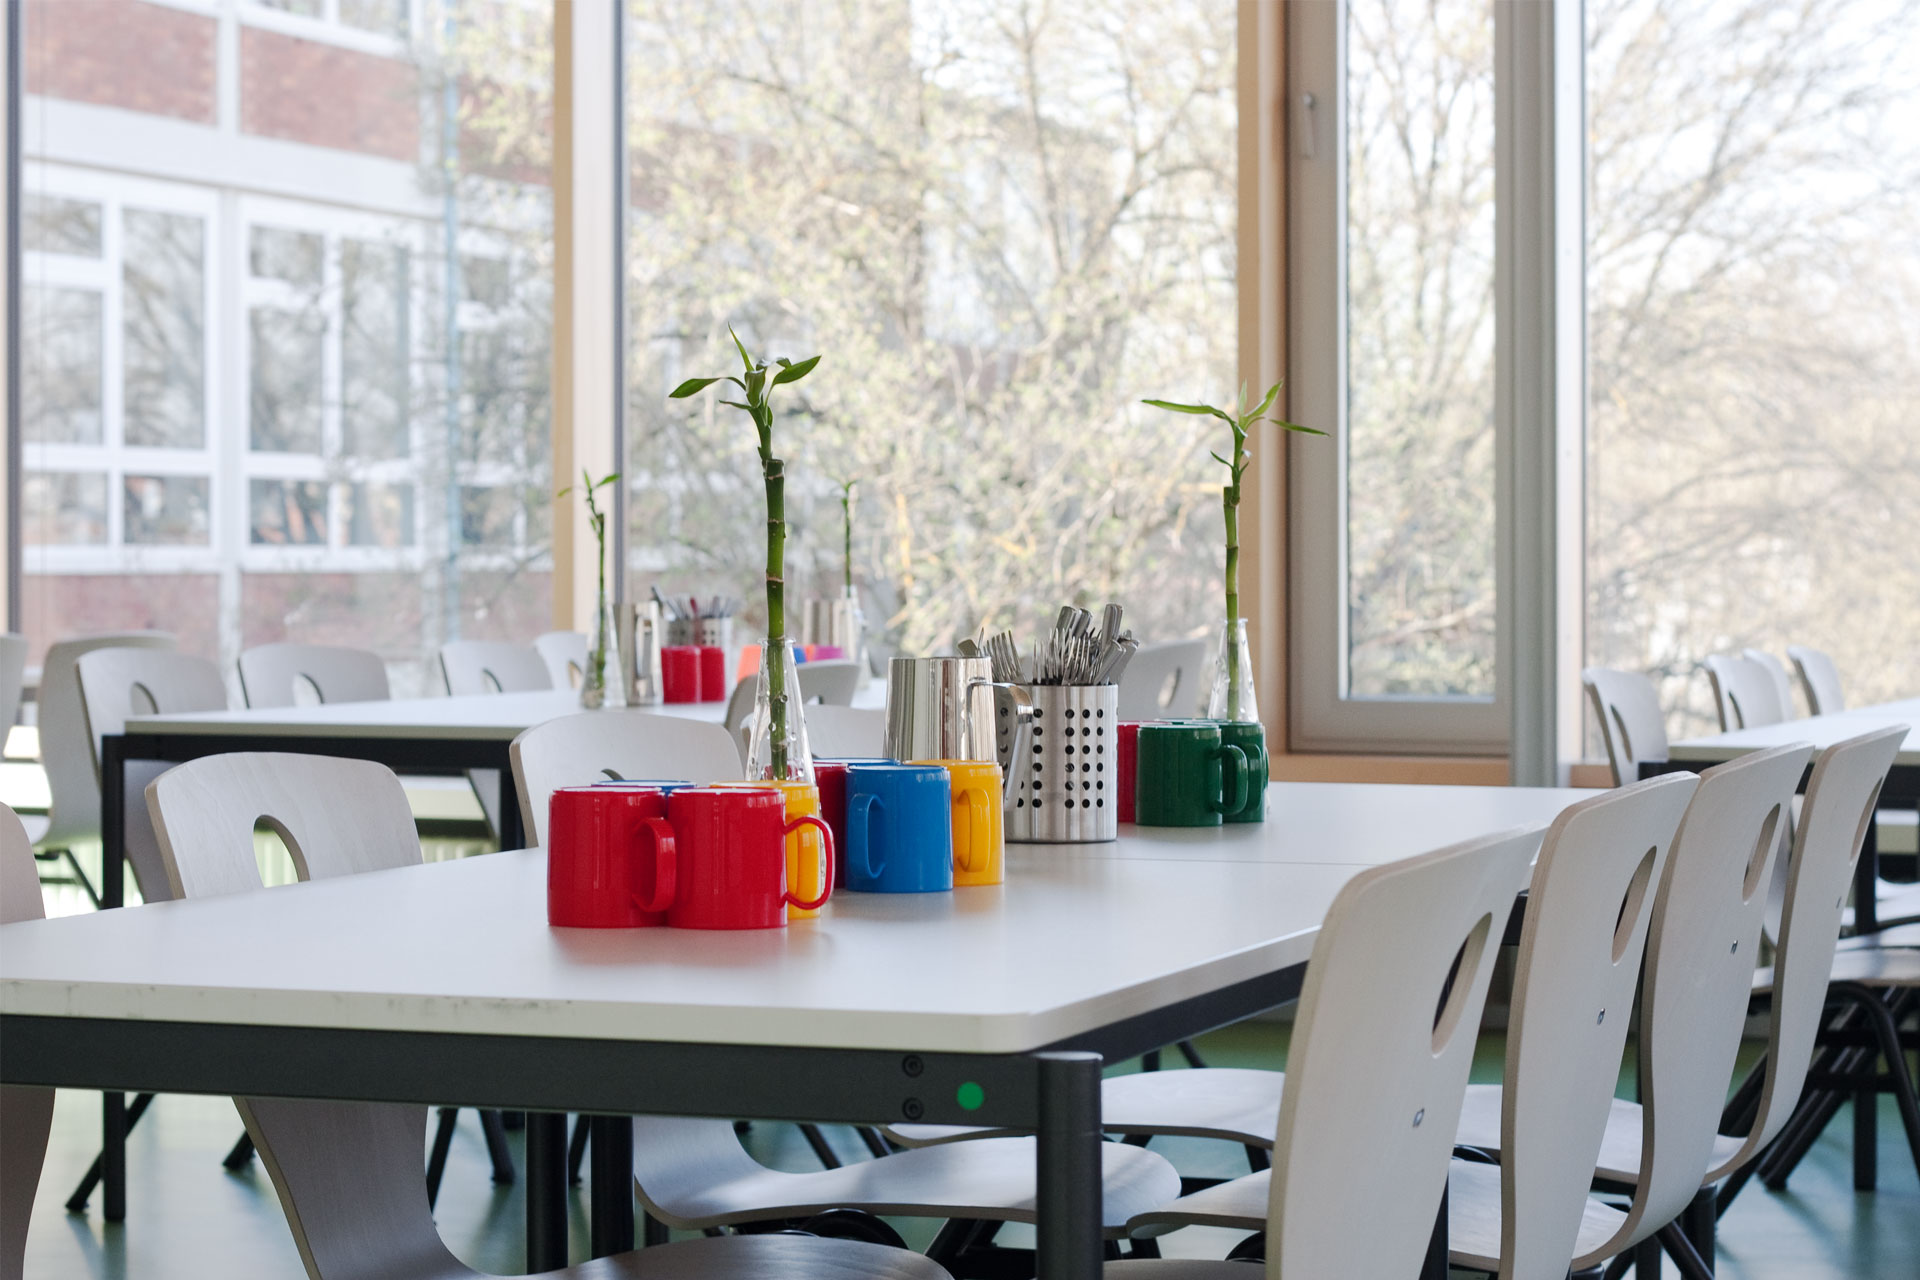 Architekt, Schülermensa, Möblierung